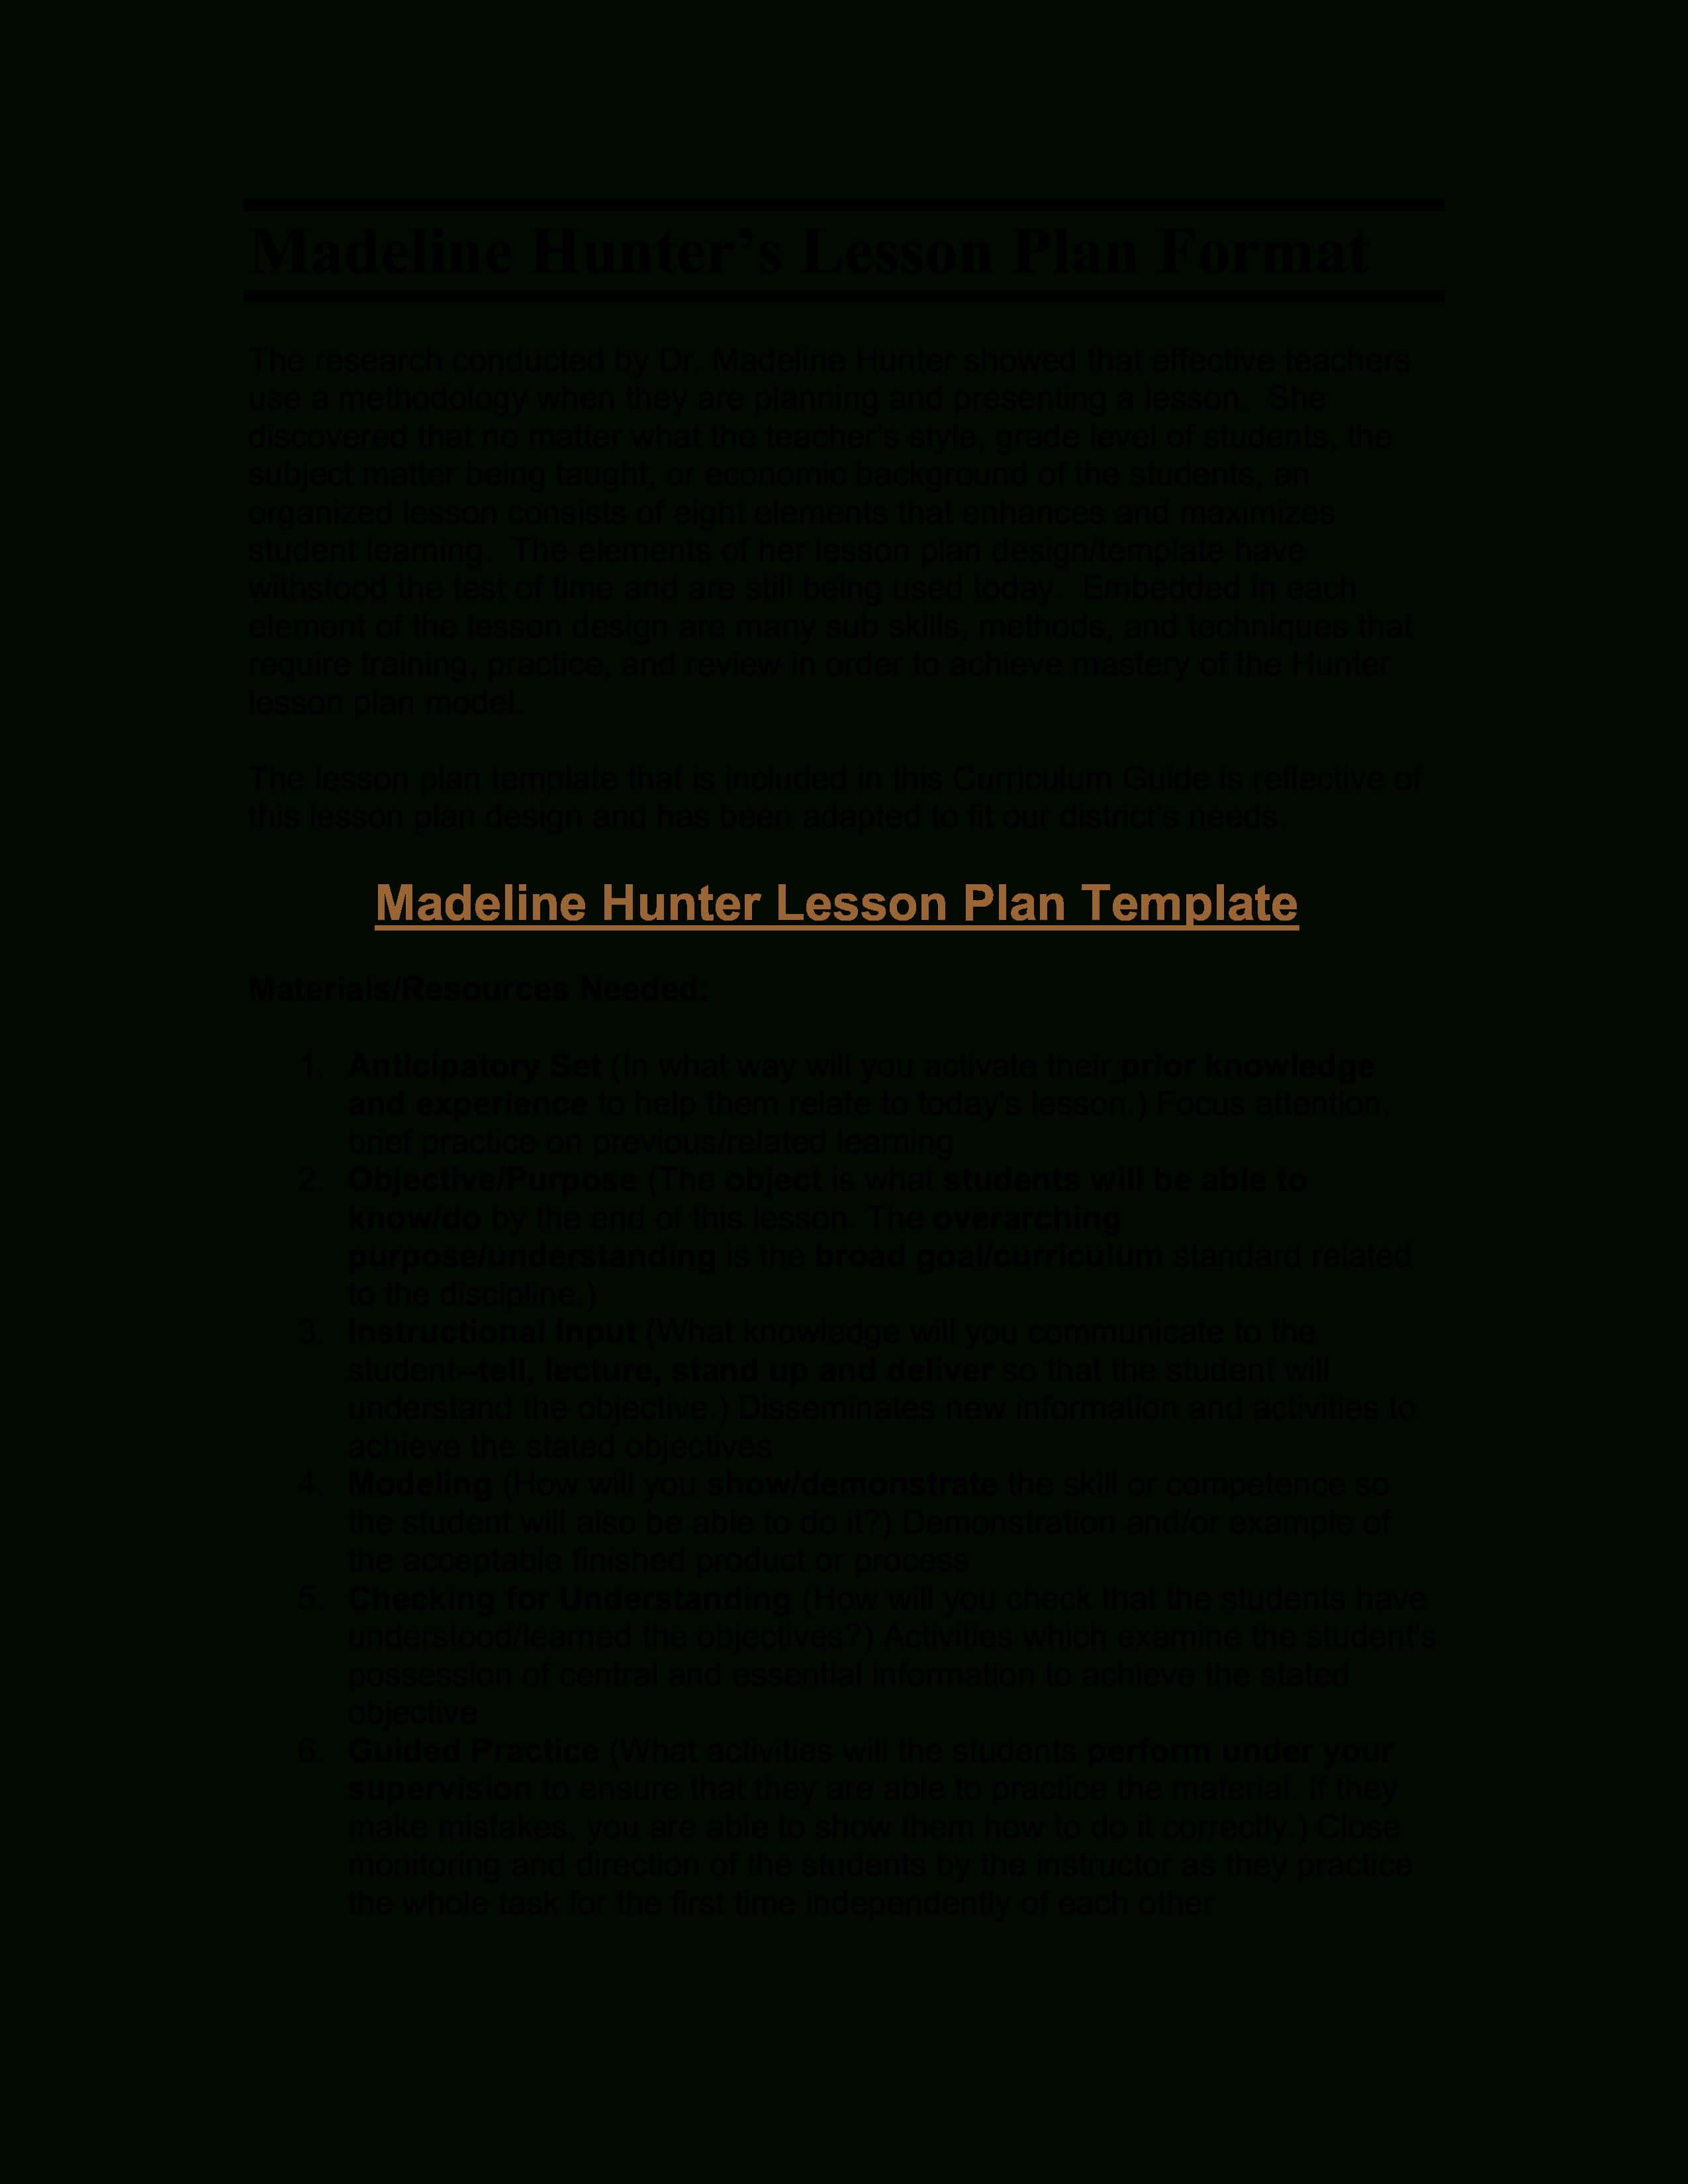 Microsoft Word - Madeline Hunter's Lesson Plan Format pertaining to Madeline Hunter Lesson Plan Template Blank